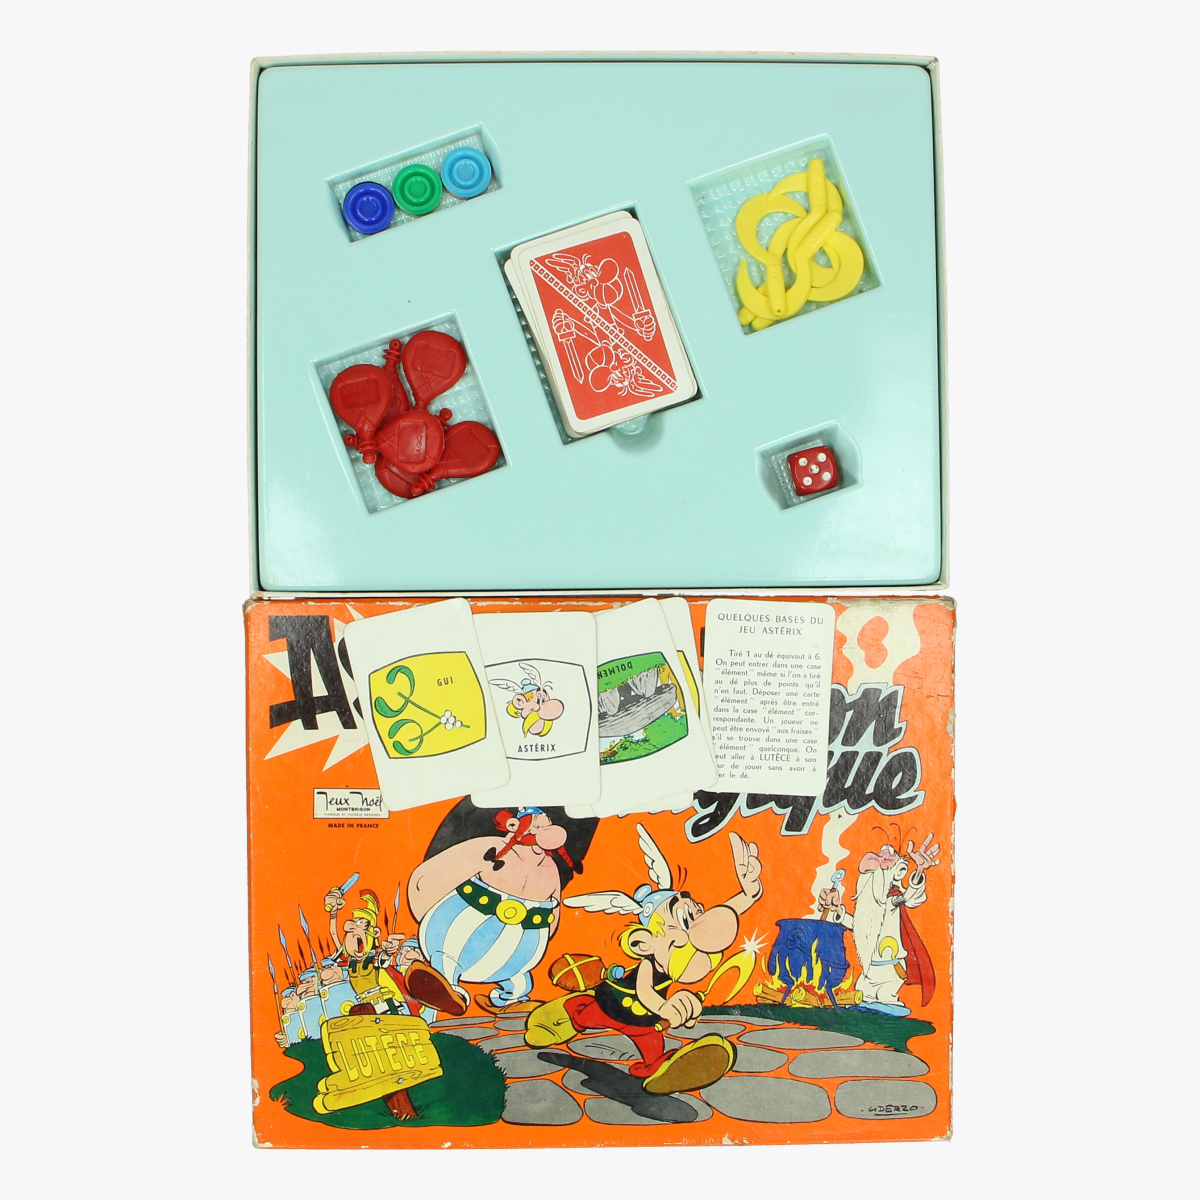 Afbeeldingen van bordspel astérix et la potion magique made in france